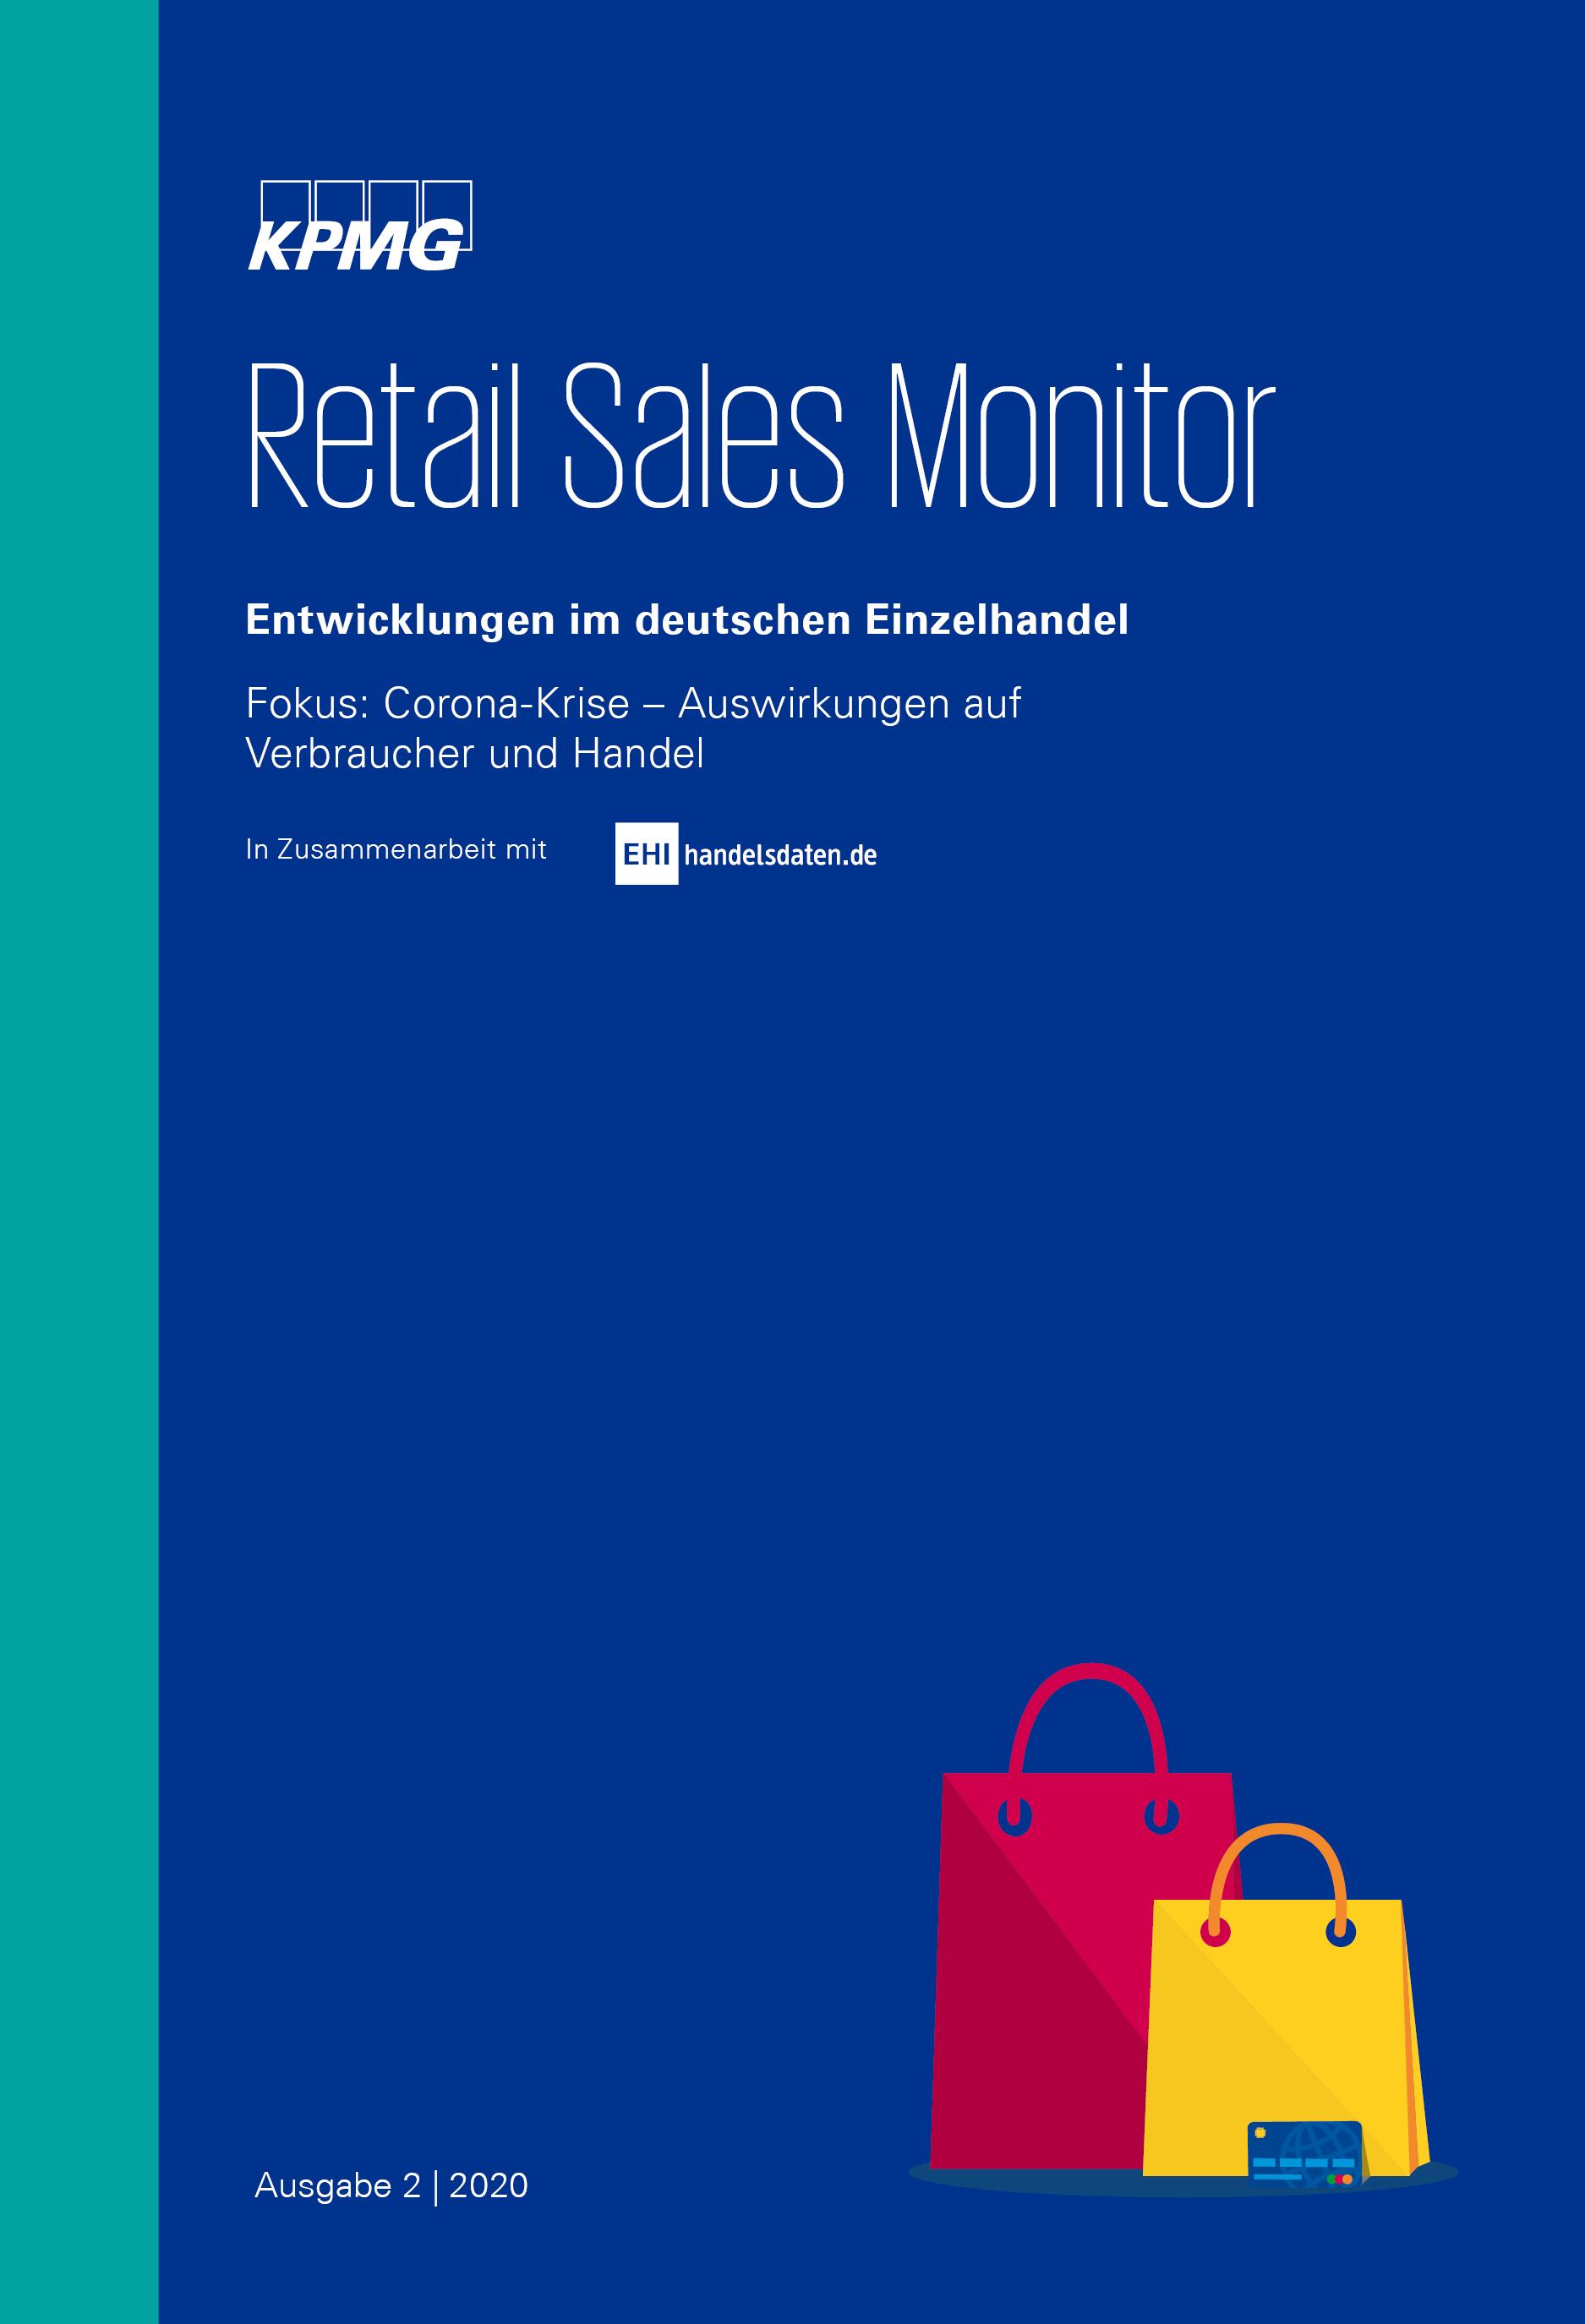 kpmg-retail-sales-monitor-02-2020-450x660